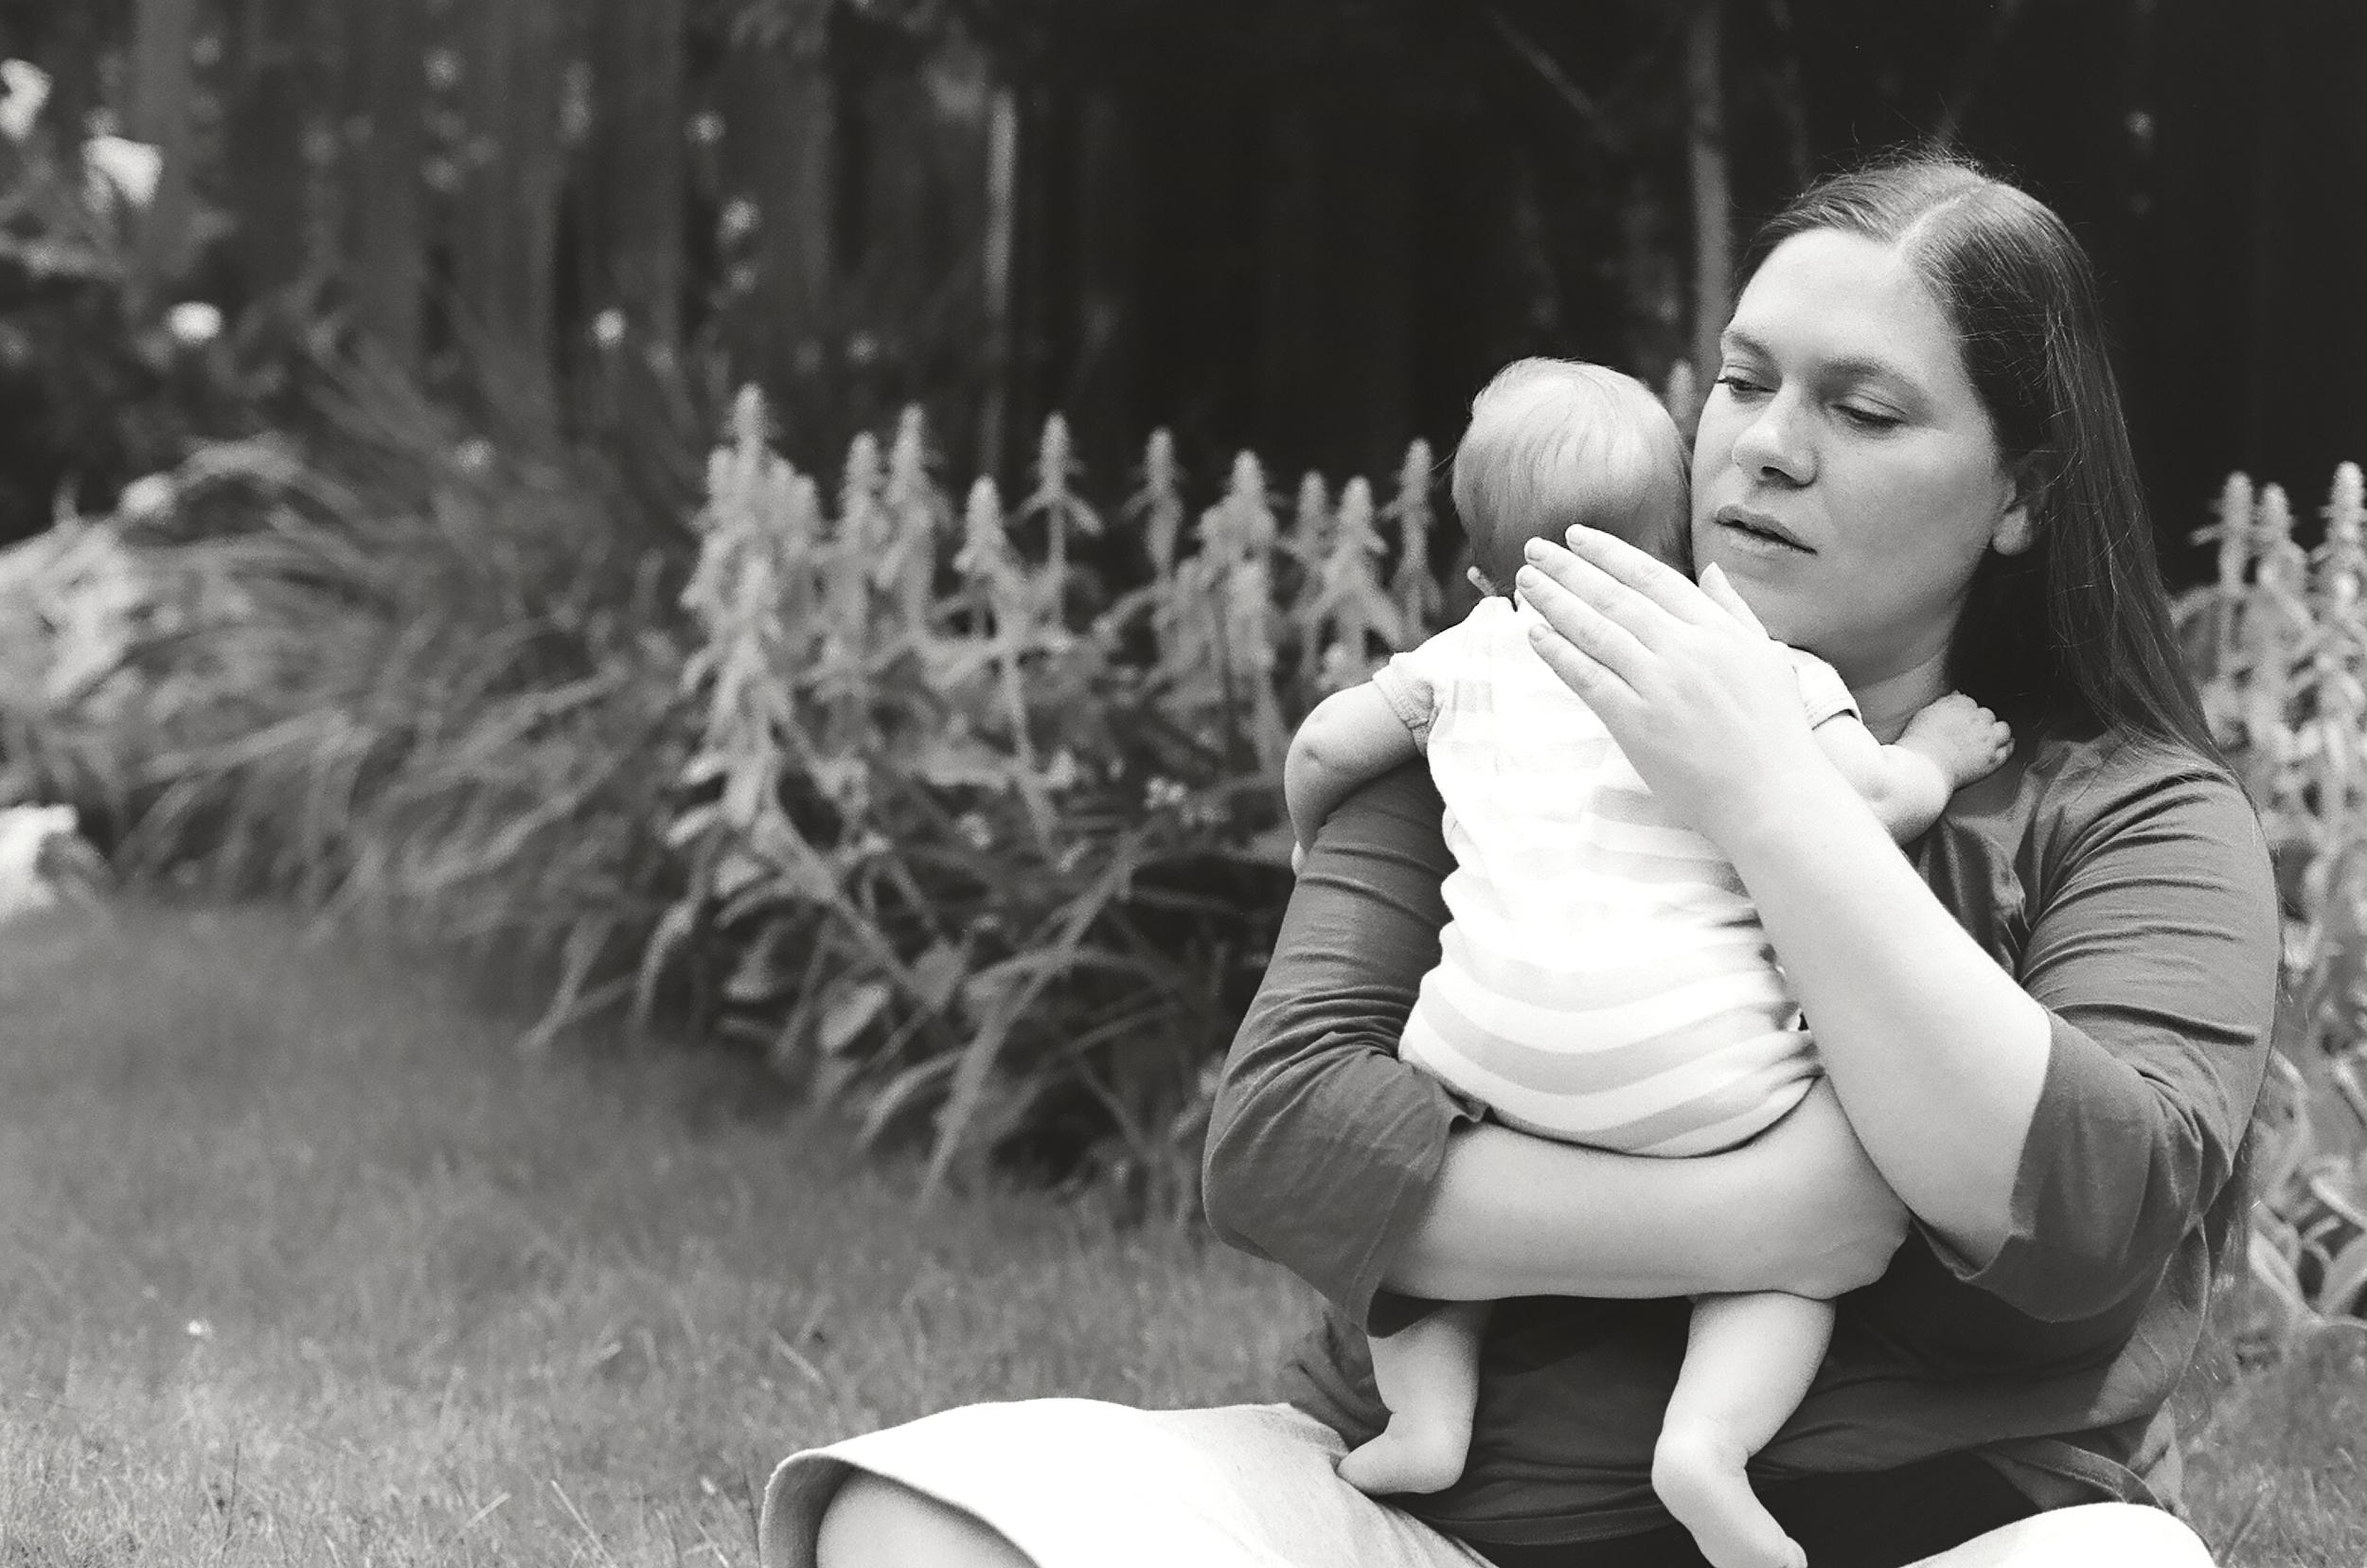 laurenlphotography(motherhood) (5).jpg